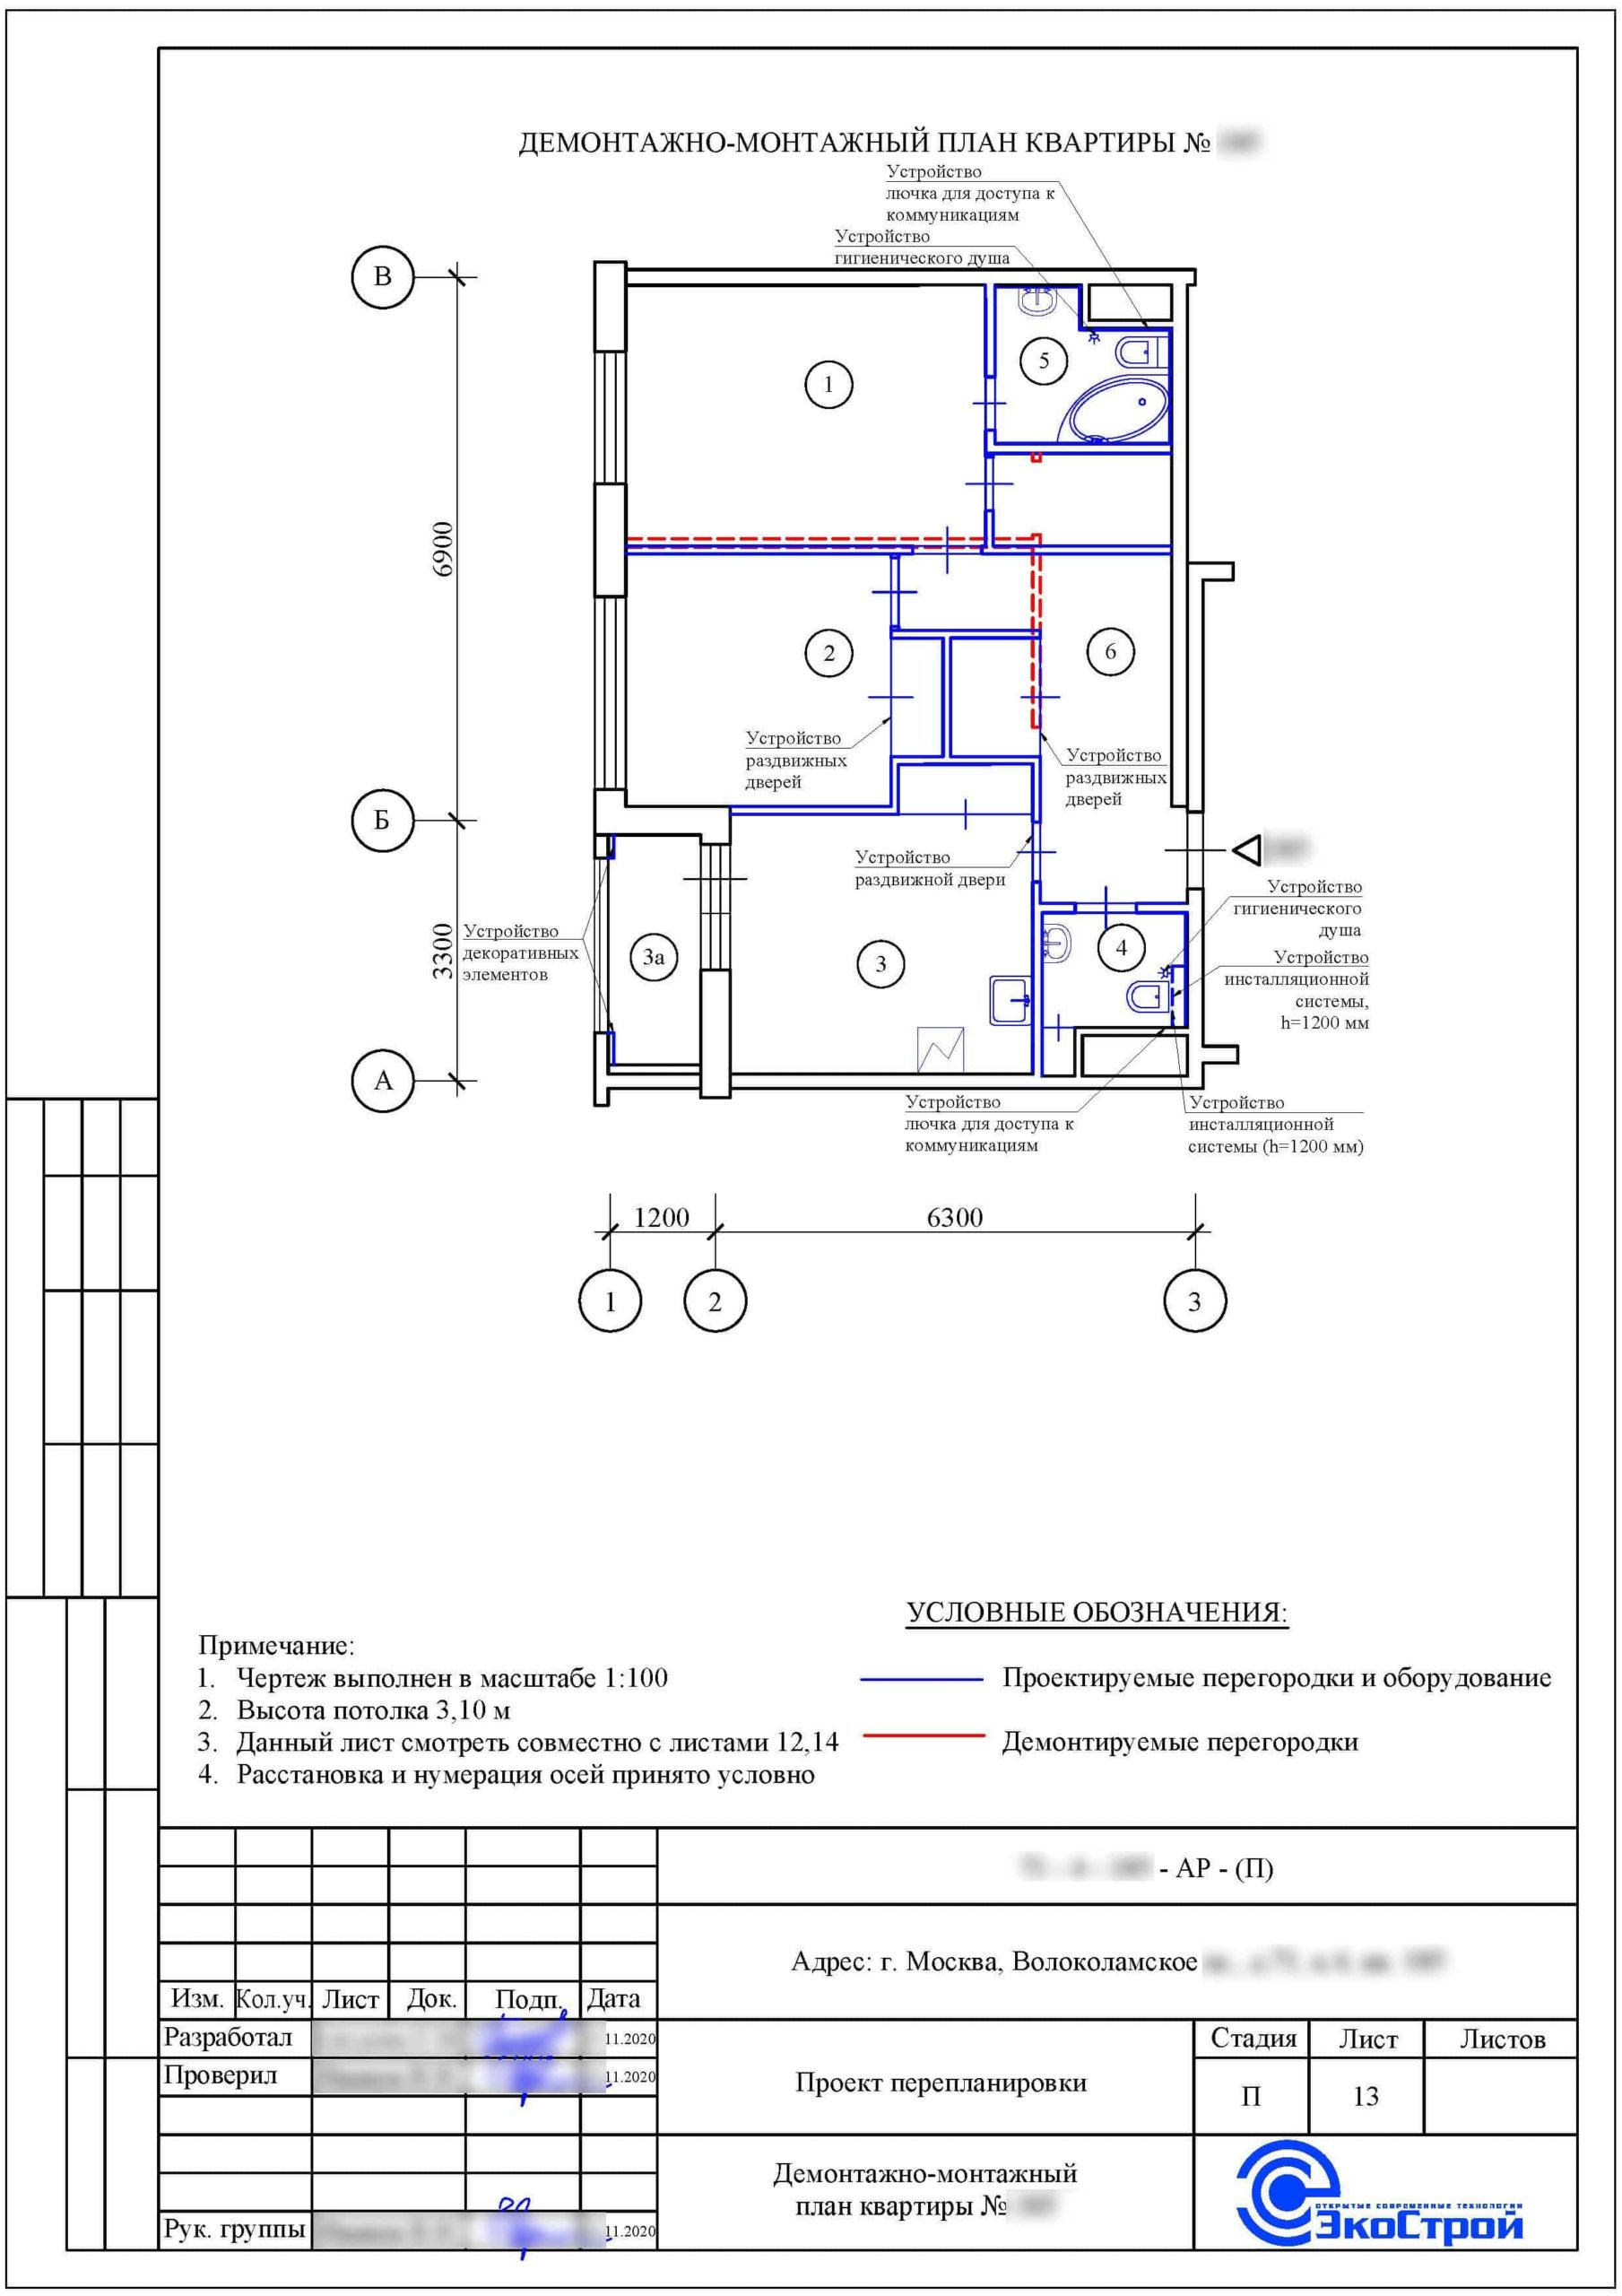 Демонтажно-монтажный план квартиры